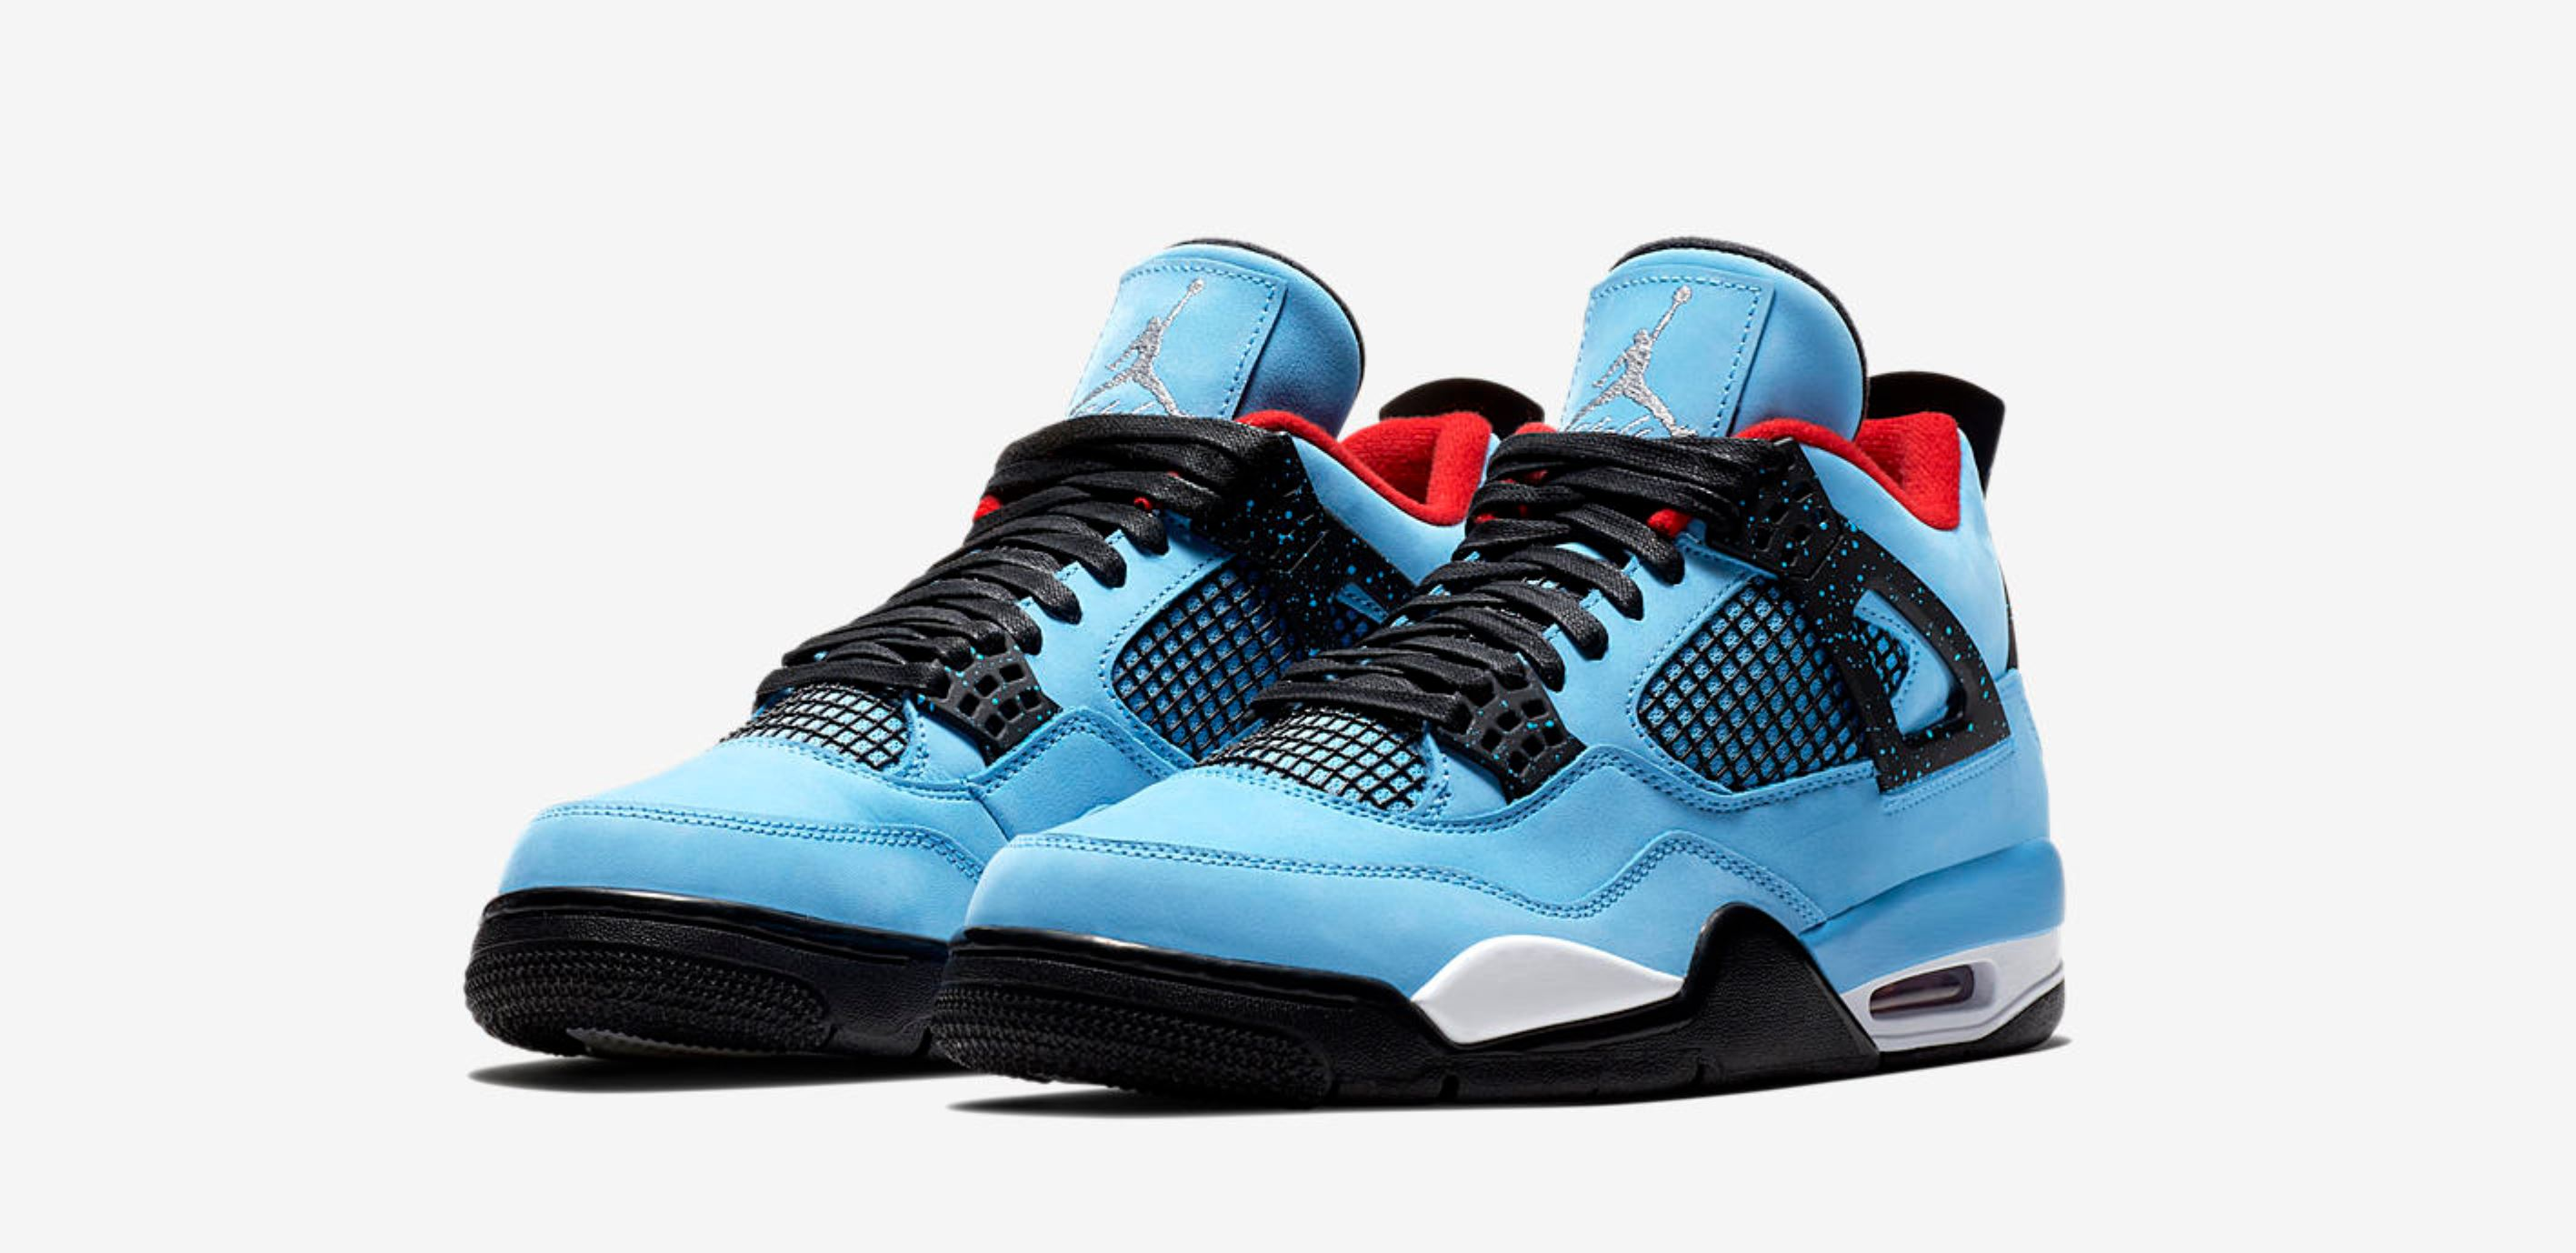 c51969864a6fcd Jordan Brand   Kicks On Court   Release Reminder ...